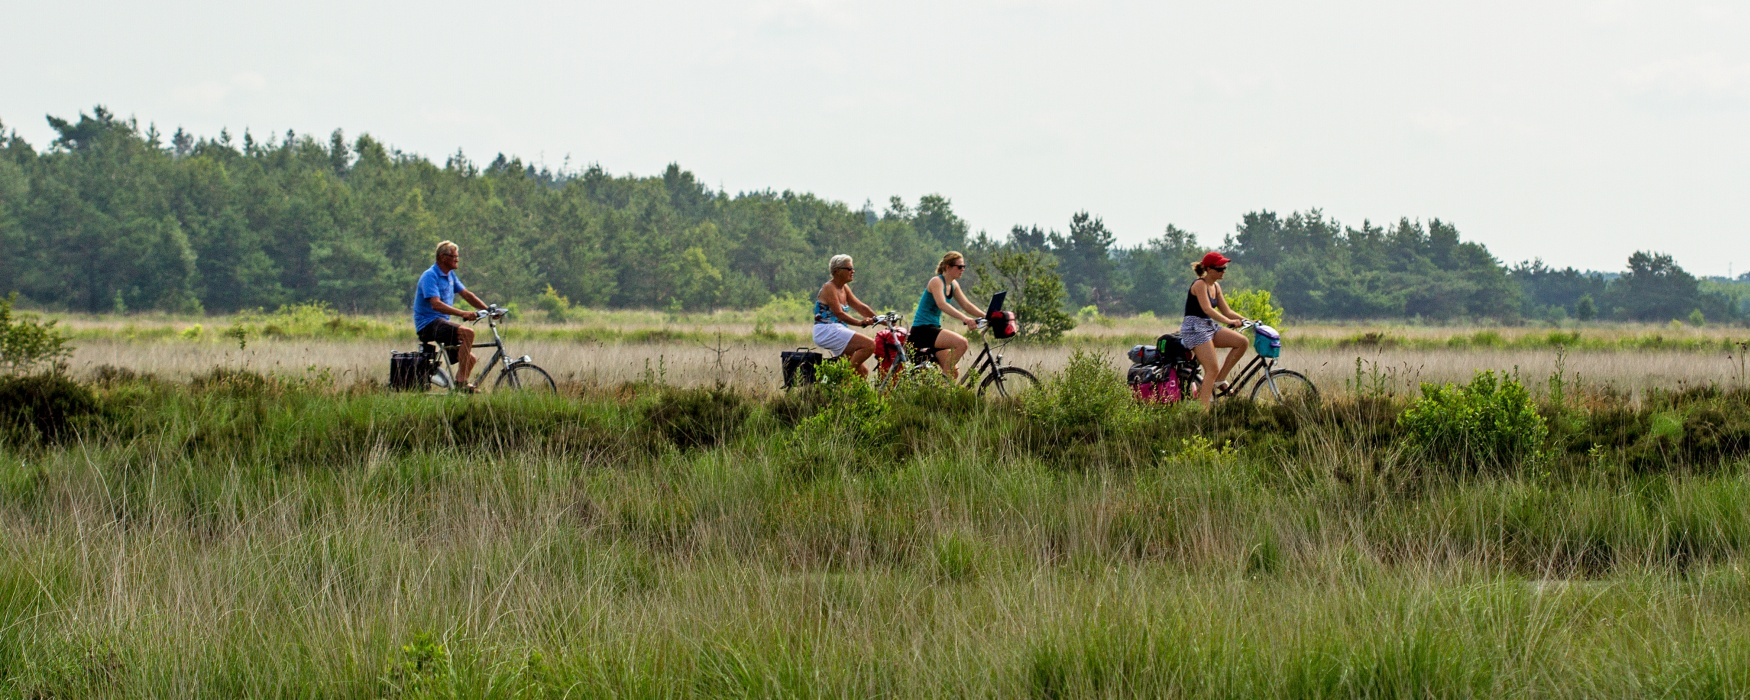 3 Provinciën Fiets-3-daagse vanuit Bakkeveen: Friesland | Drenthe | Groningen